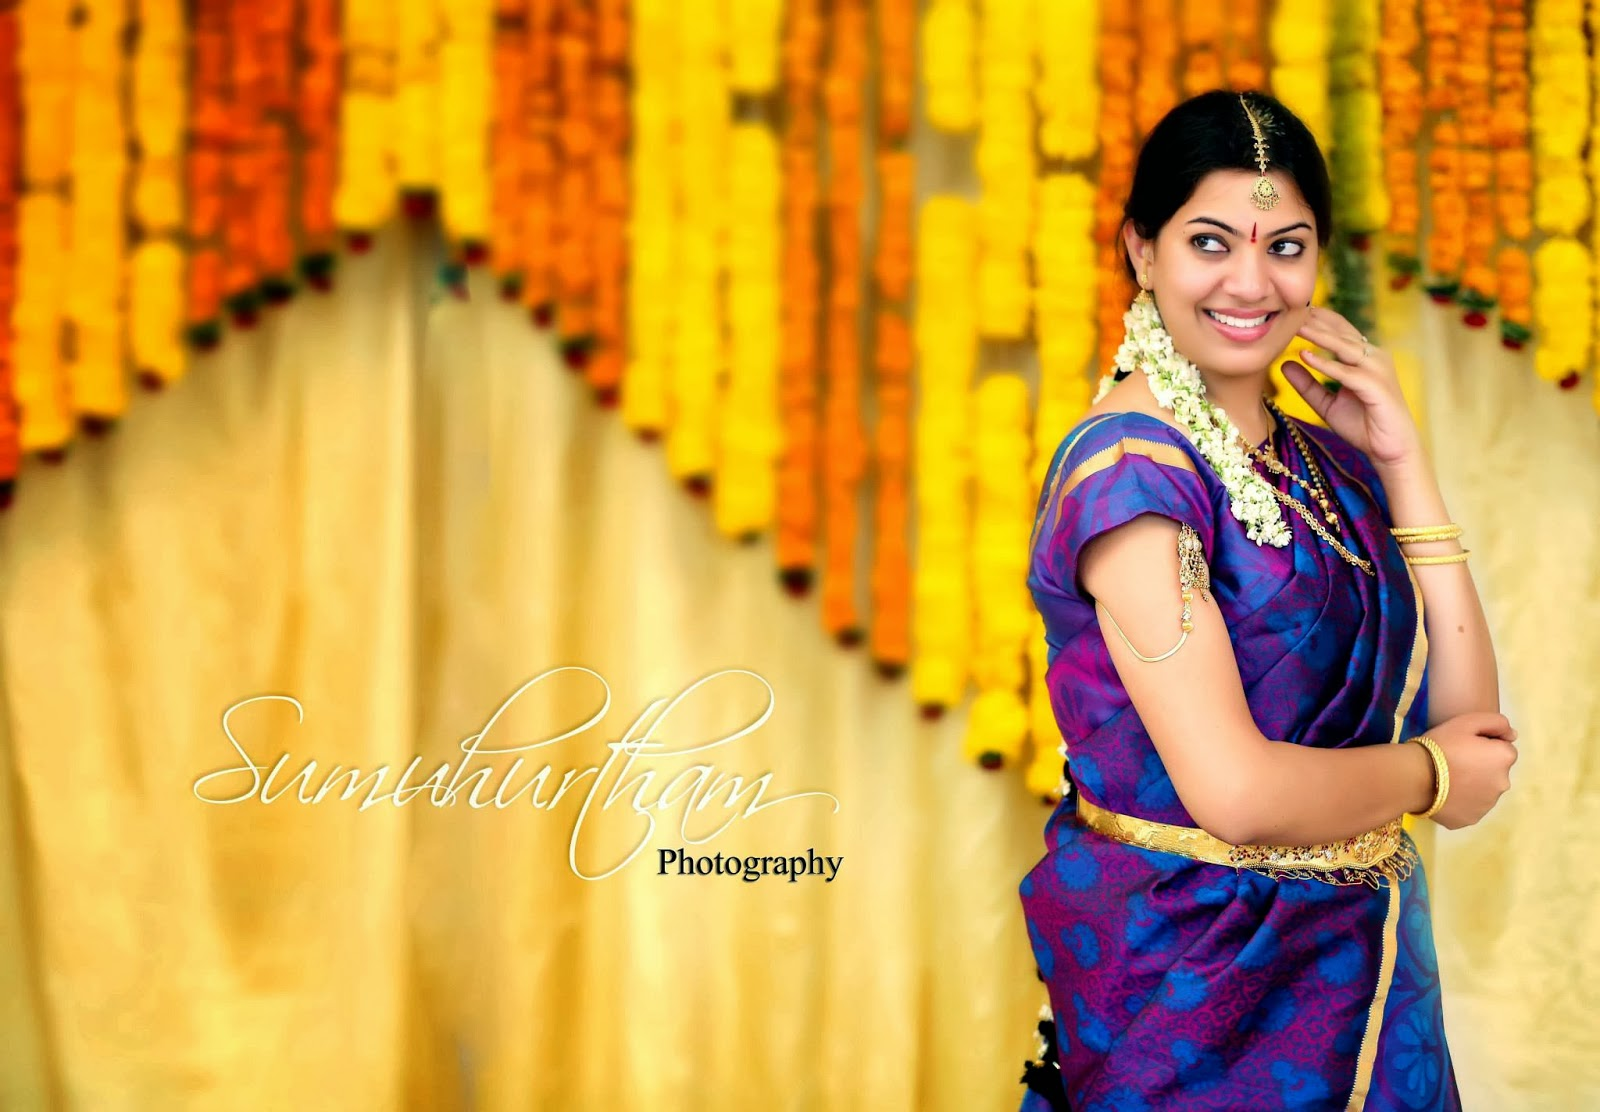 Geetha Madhuri Exclusive Photoshoot - AtozCineGallery